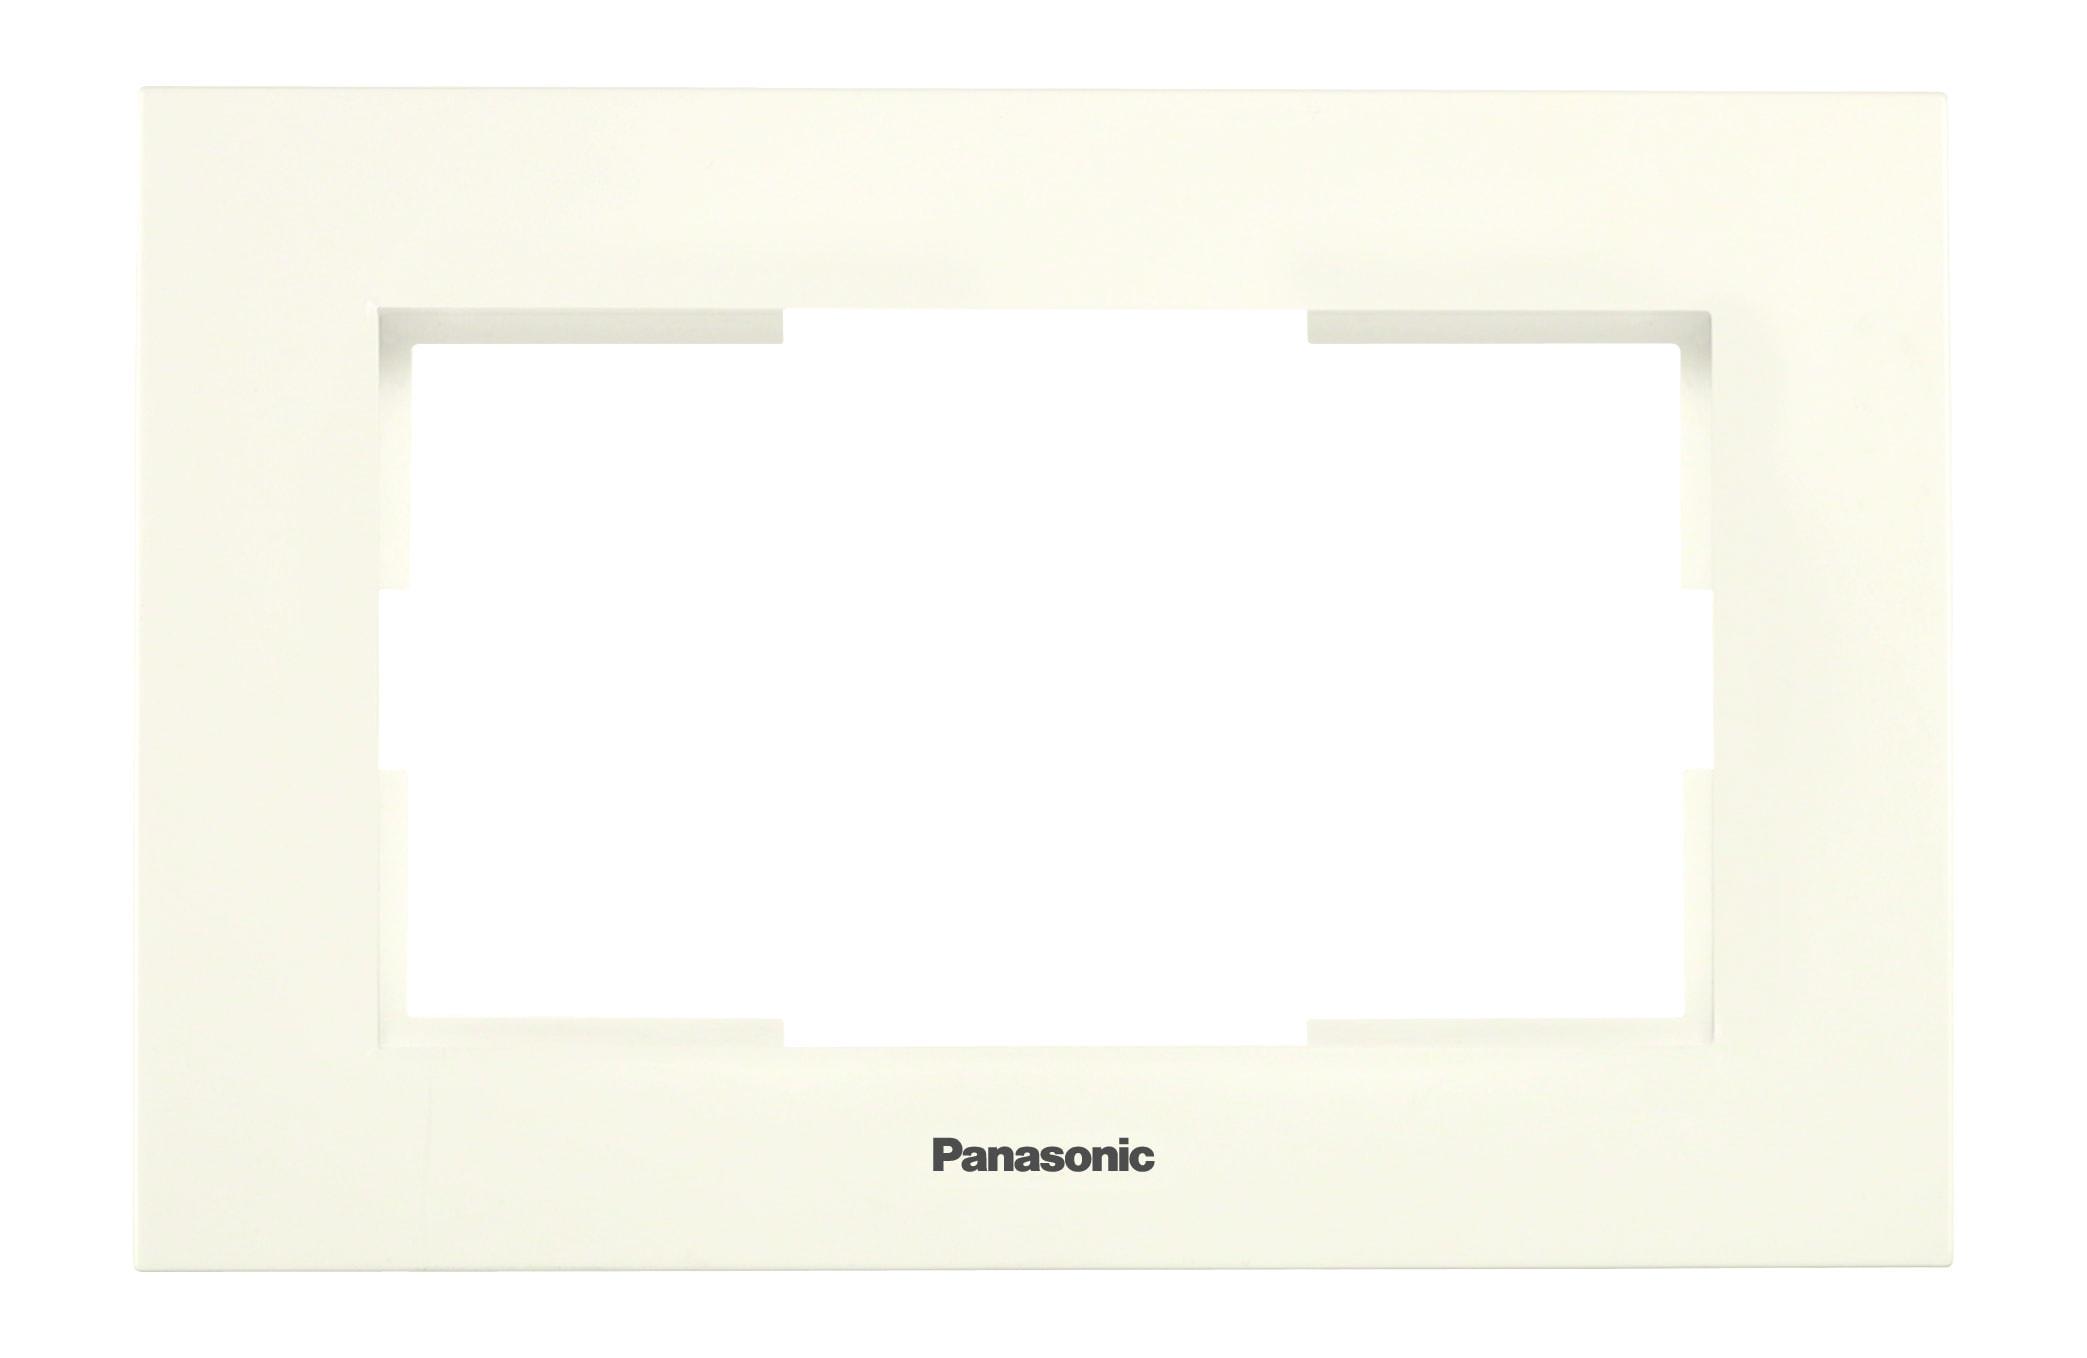 Рамка Panasonic Wktf0805-2dg-res karre plus dg рамка для фото jardo